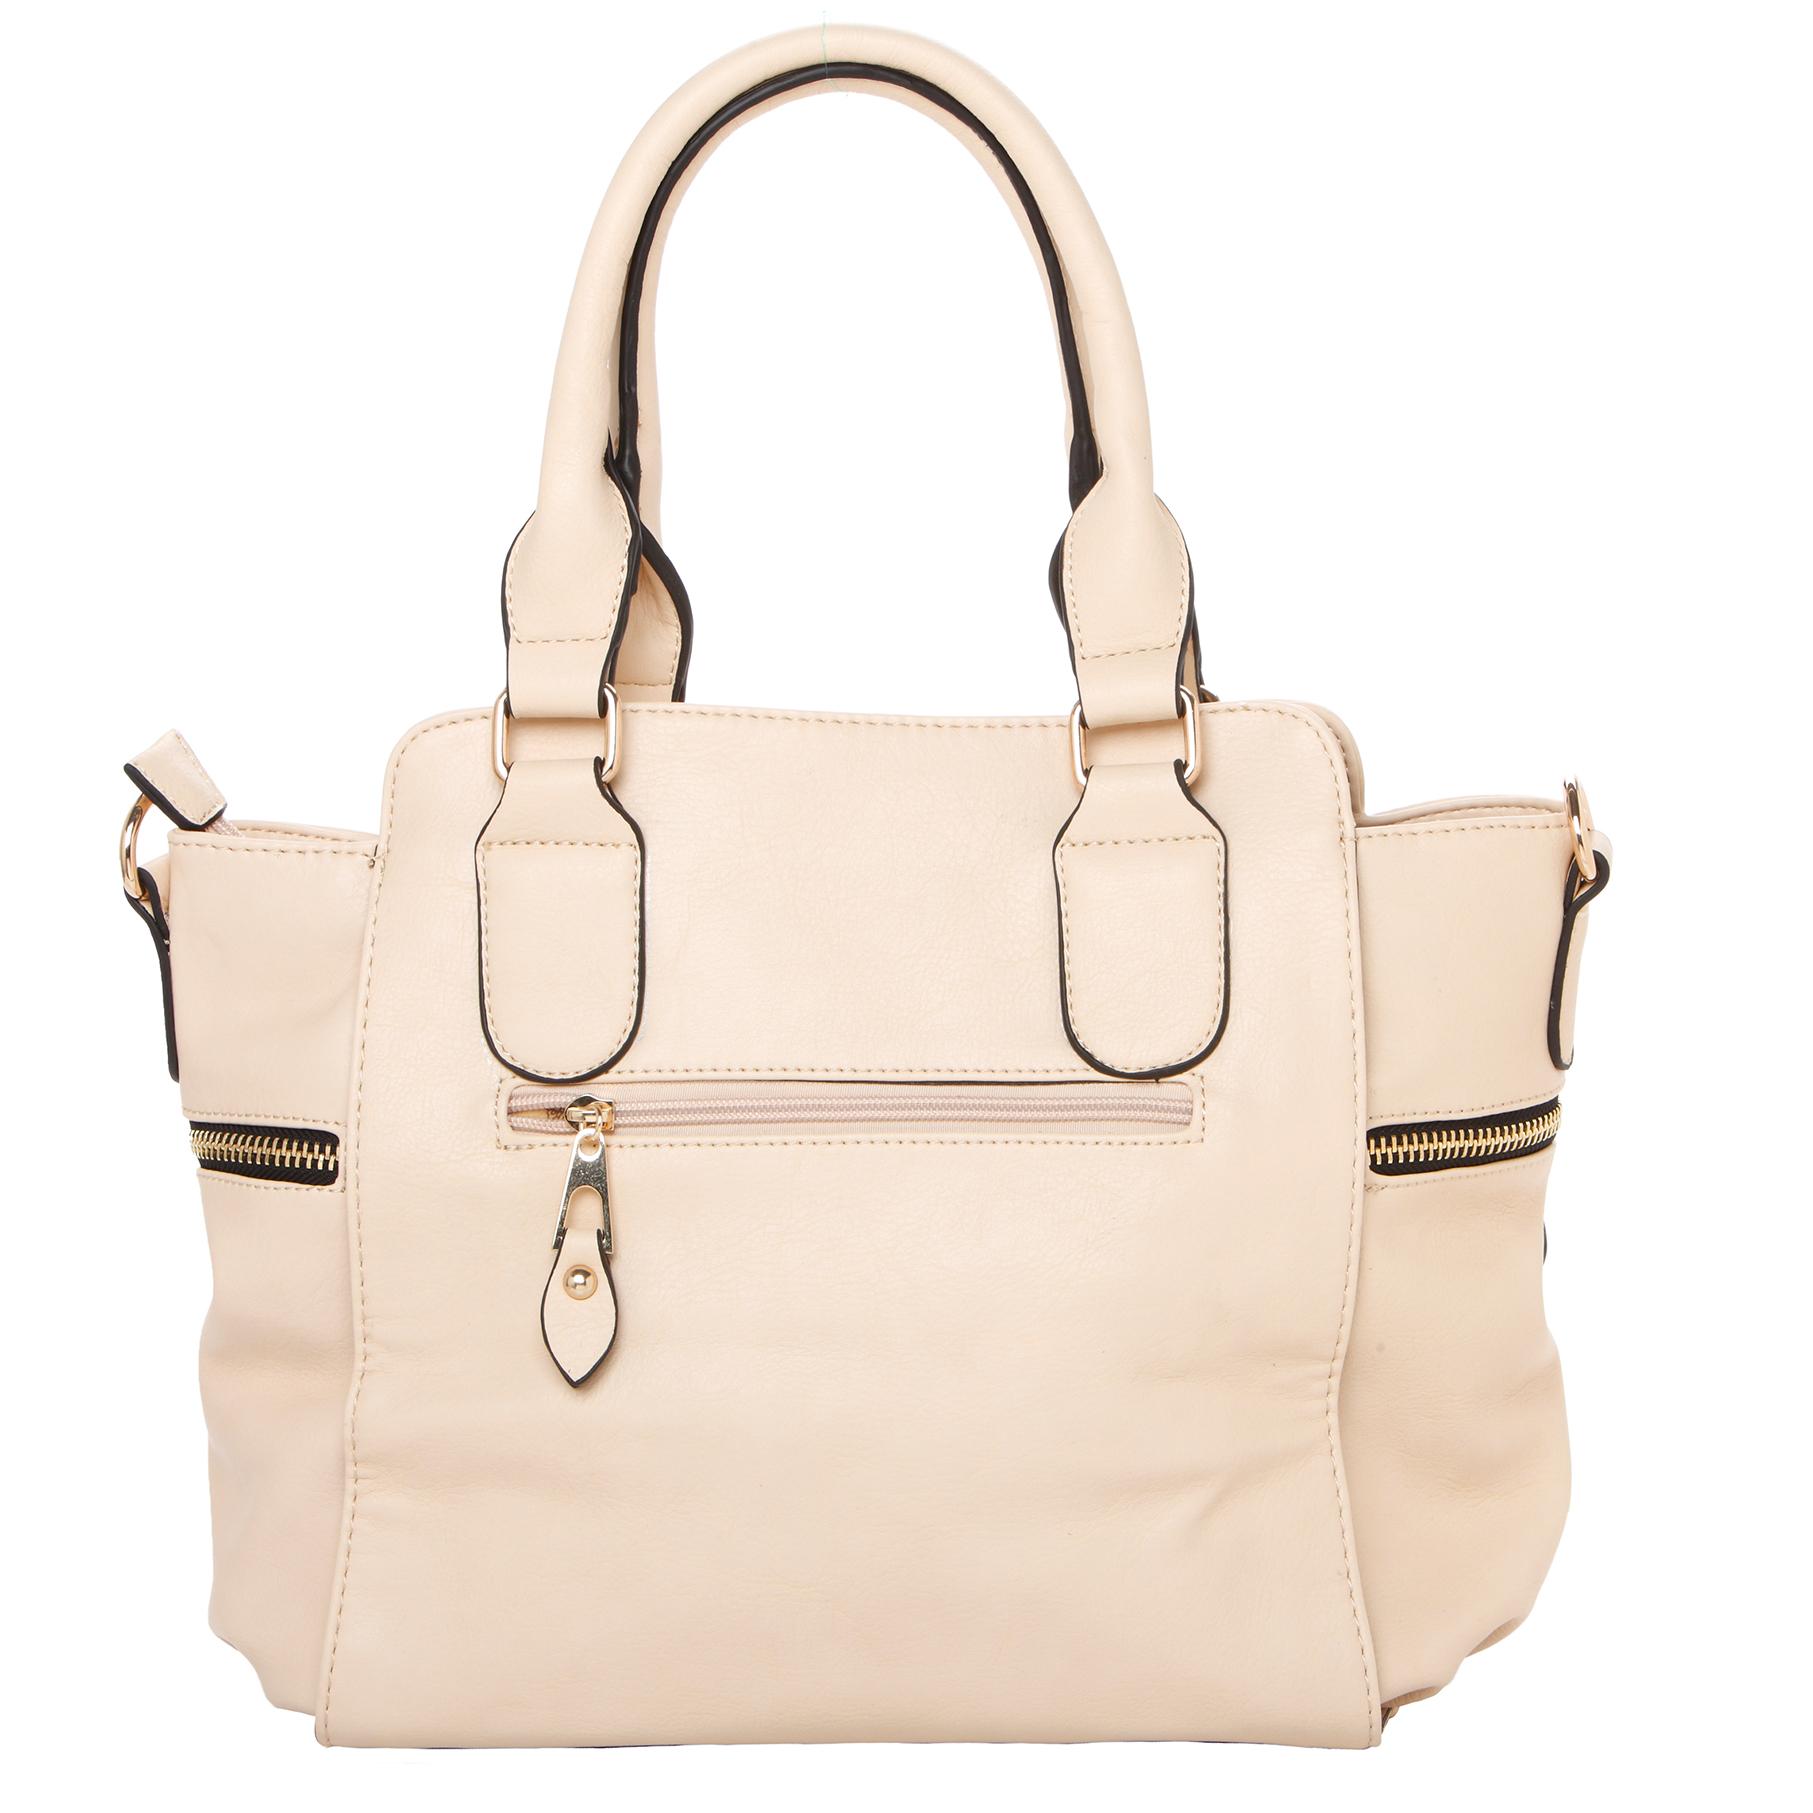 NORI Beige Top Handle Office Tote Style Satchel Handbag back